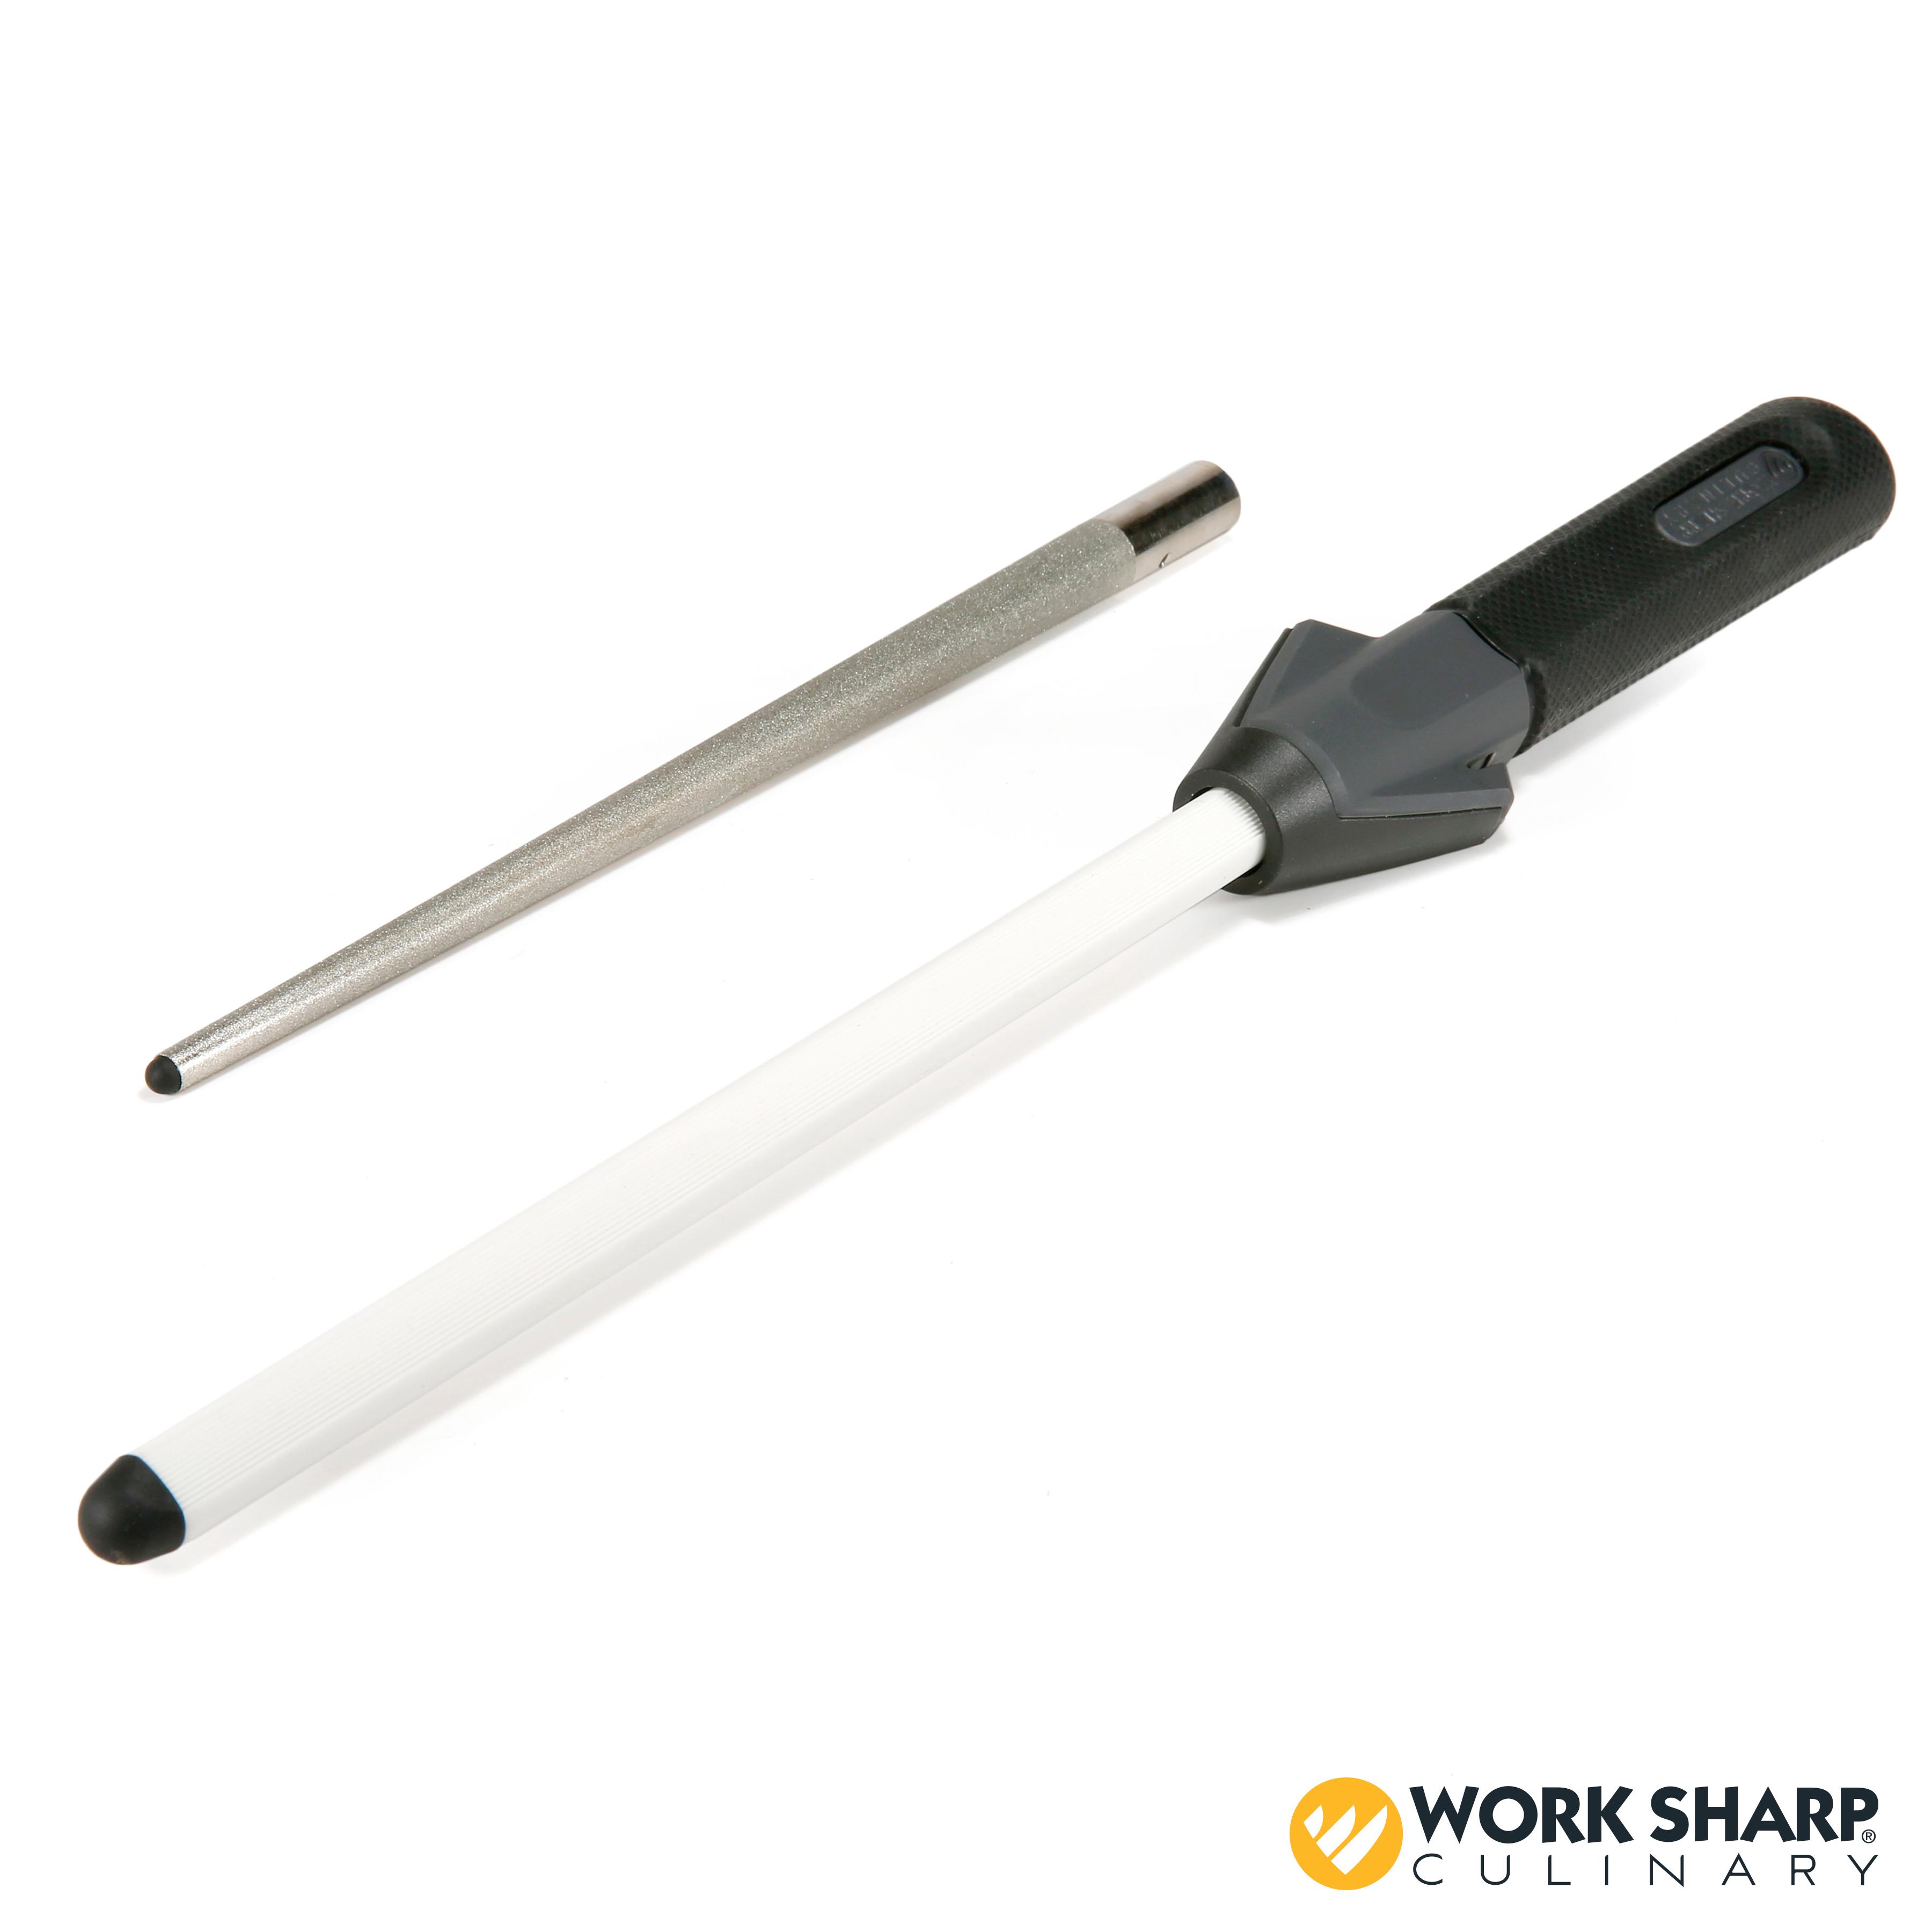 Work Sharp Culinary M3 Kitchen Knife Sharpener